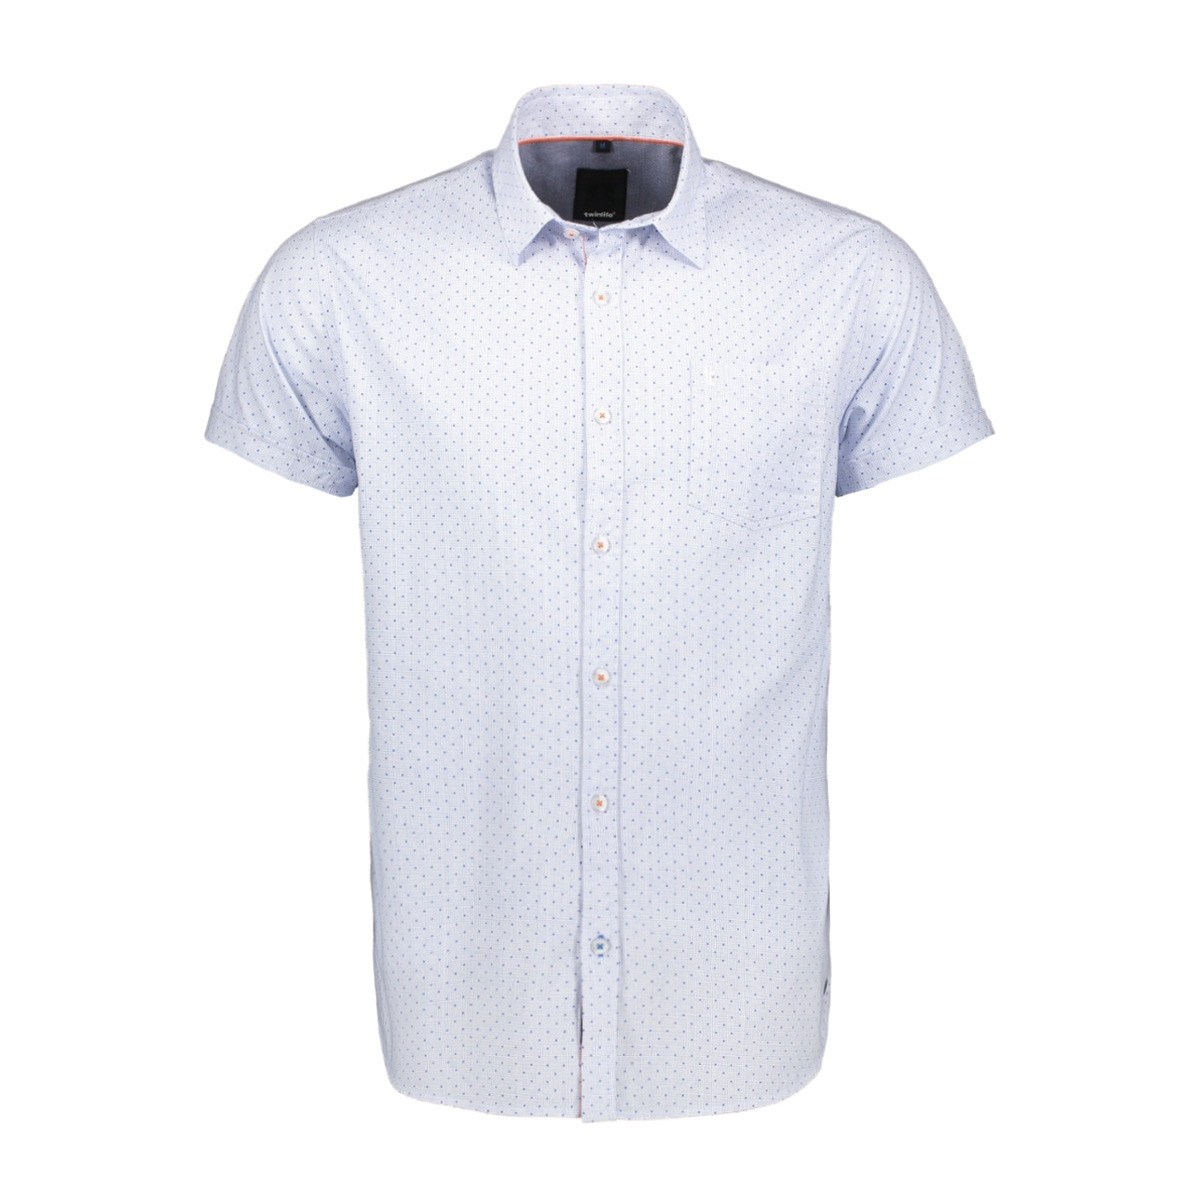 1901 2104 m 1 twinlife overhemd 1010 blanc